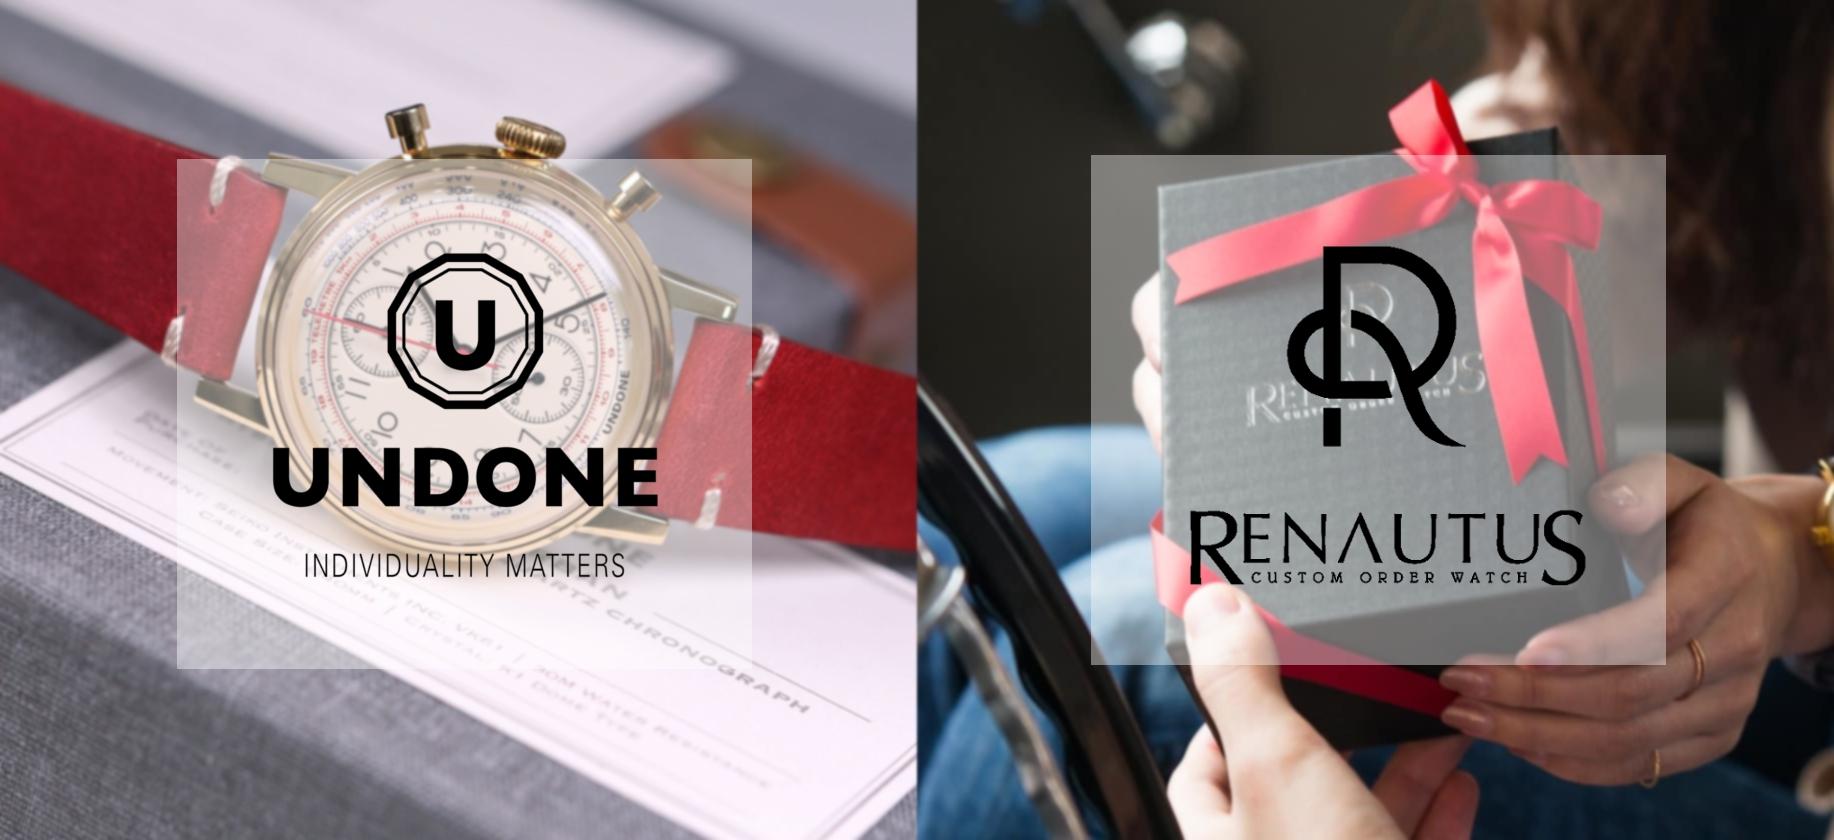 UNDONE RENATUS 比較ロゴ2